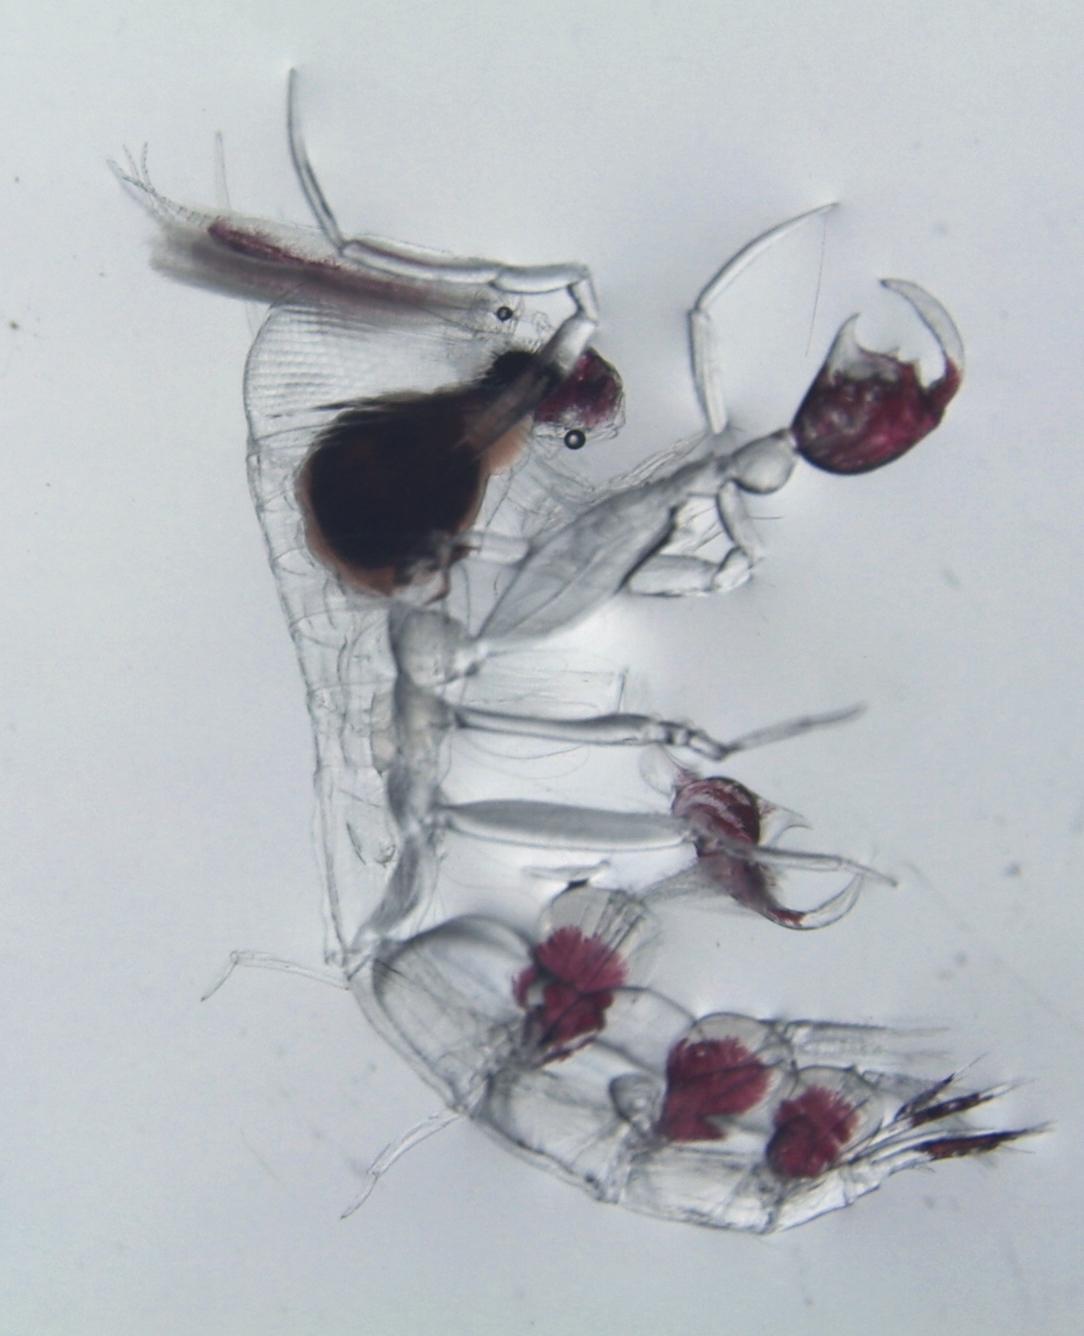 Zooplankton Pic3_Amphipod